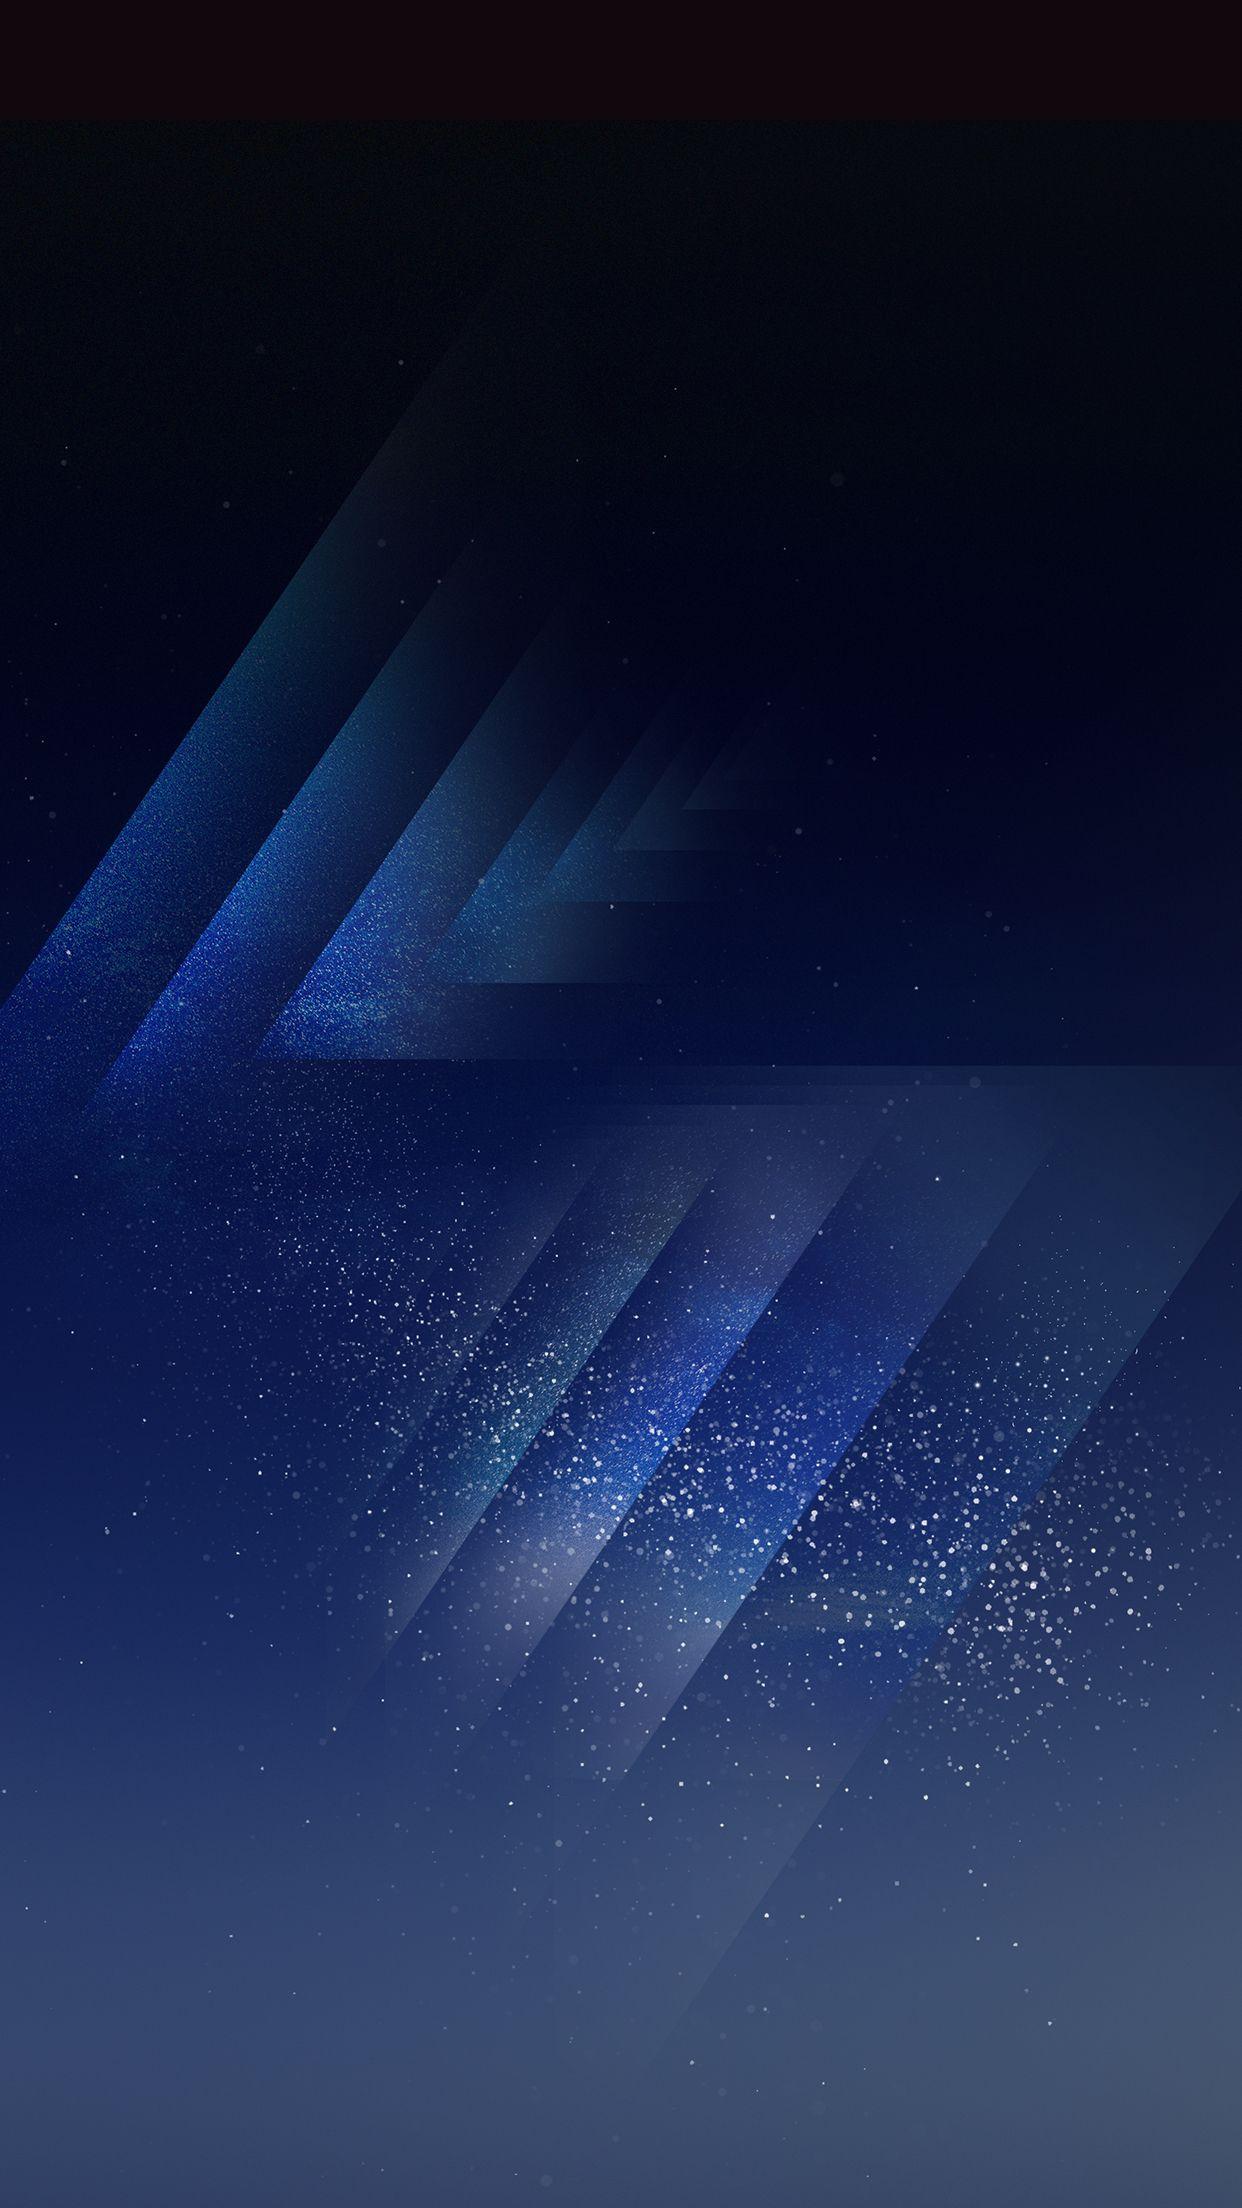 Must see Wallpaper Night Art - 3e52ed5e10869d1764afa06351787720  Pictures.jpg